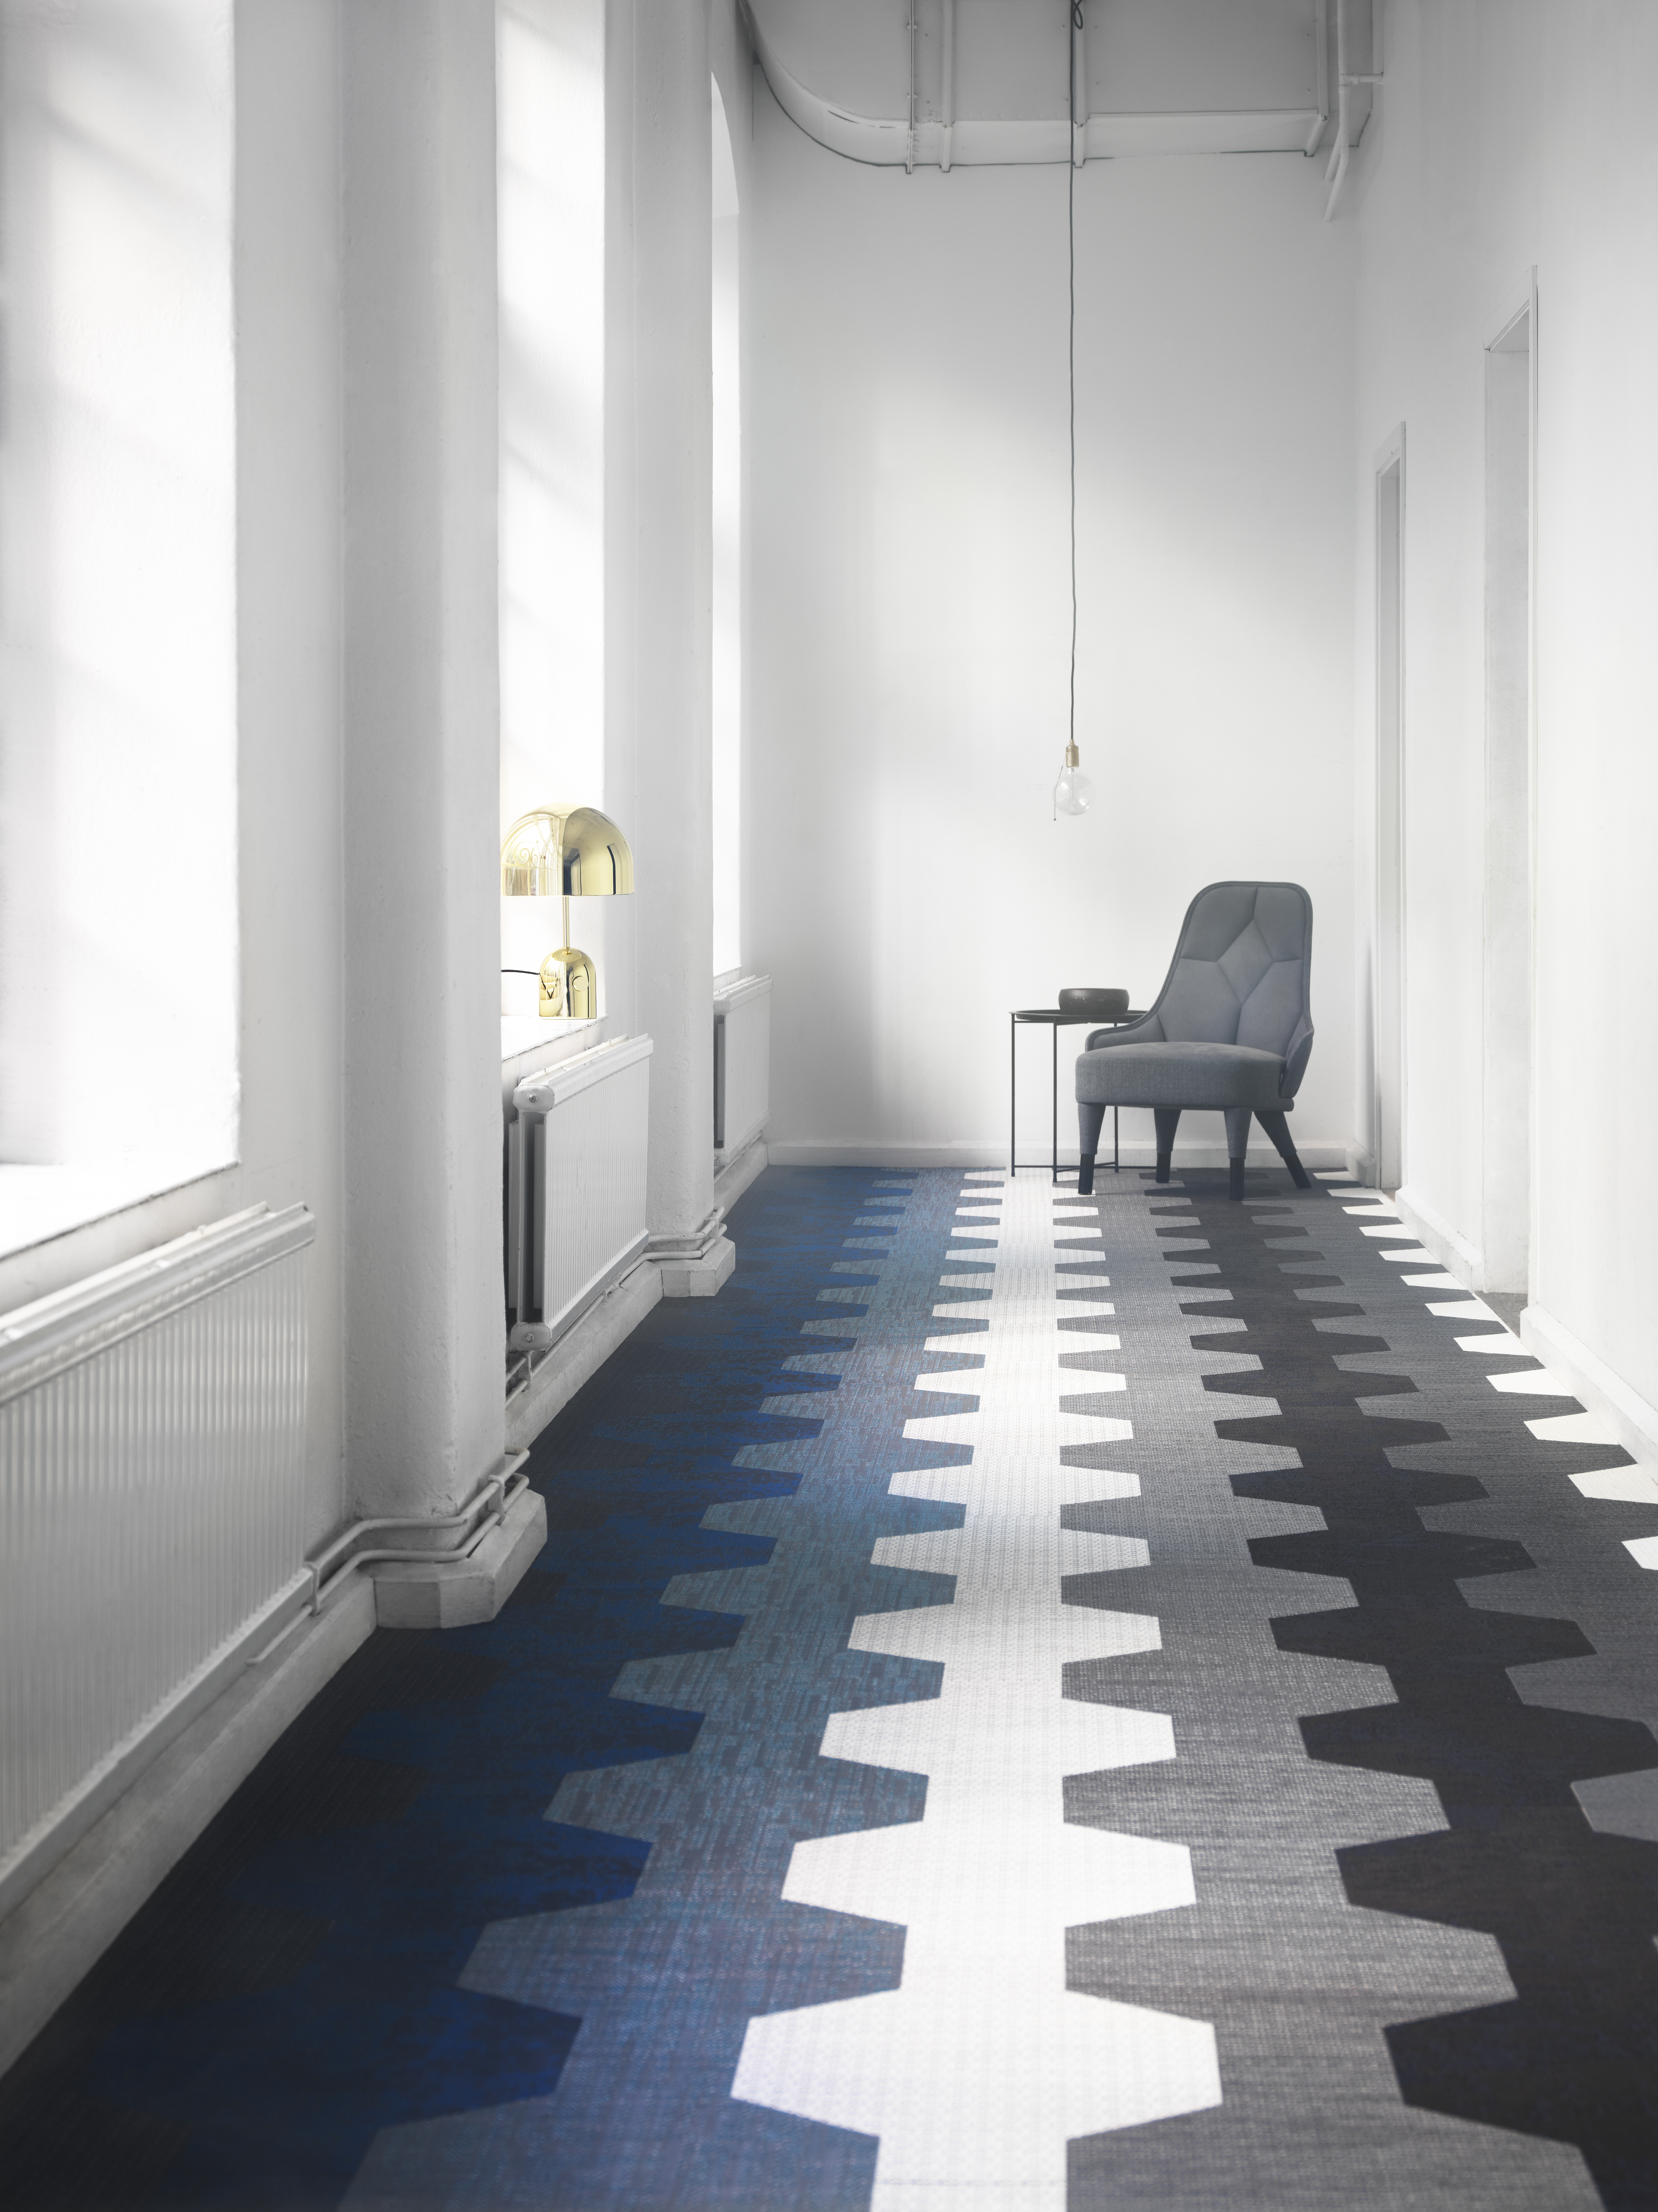 Bolon_Flooring_StudioTiles_Deco